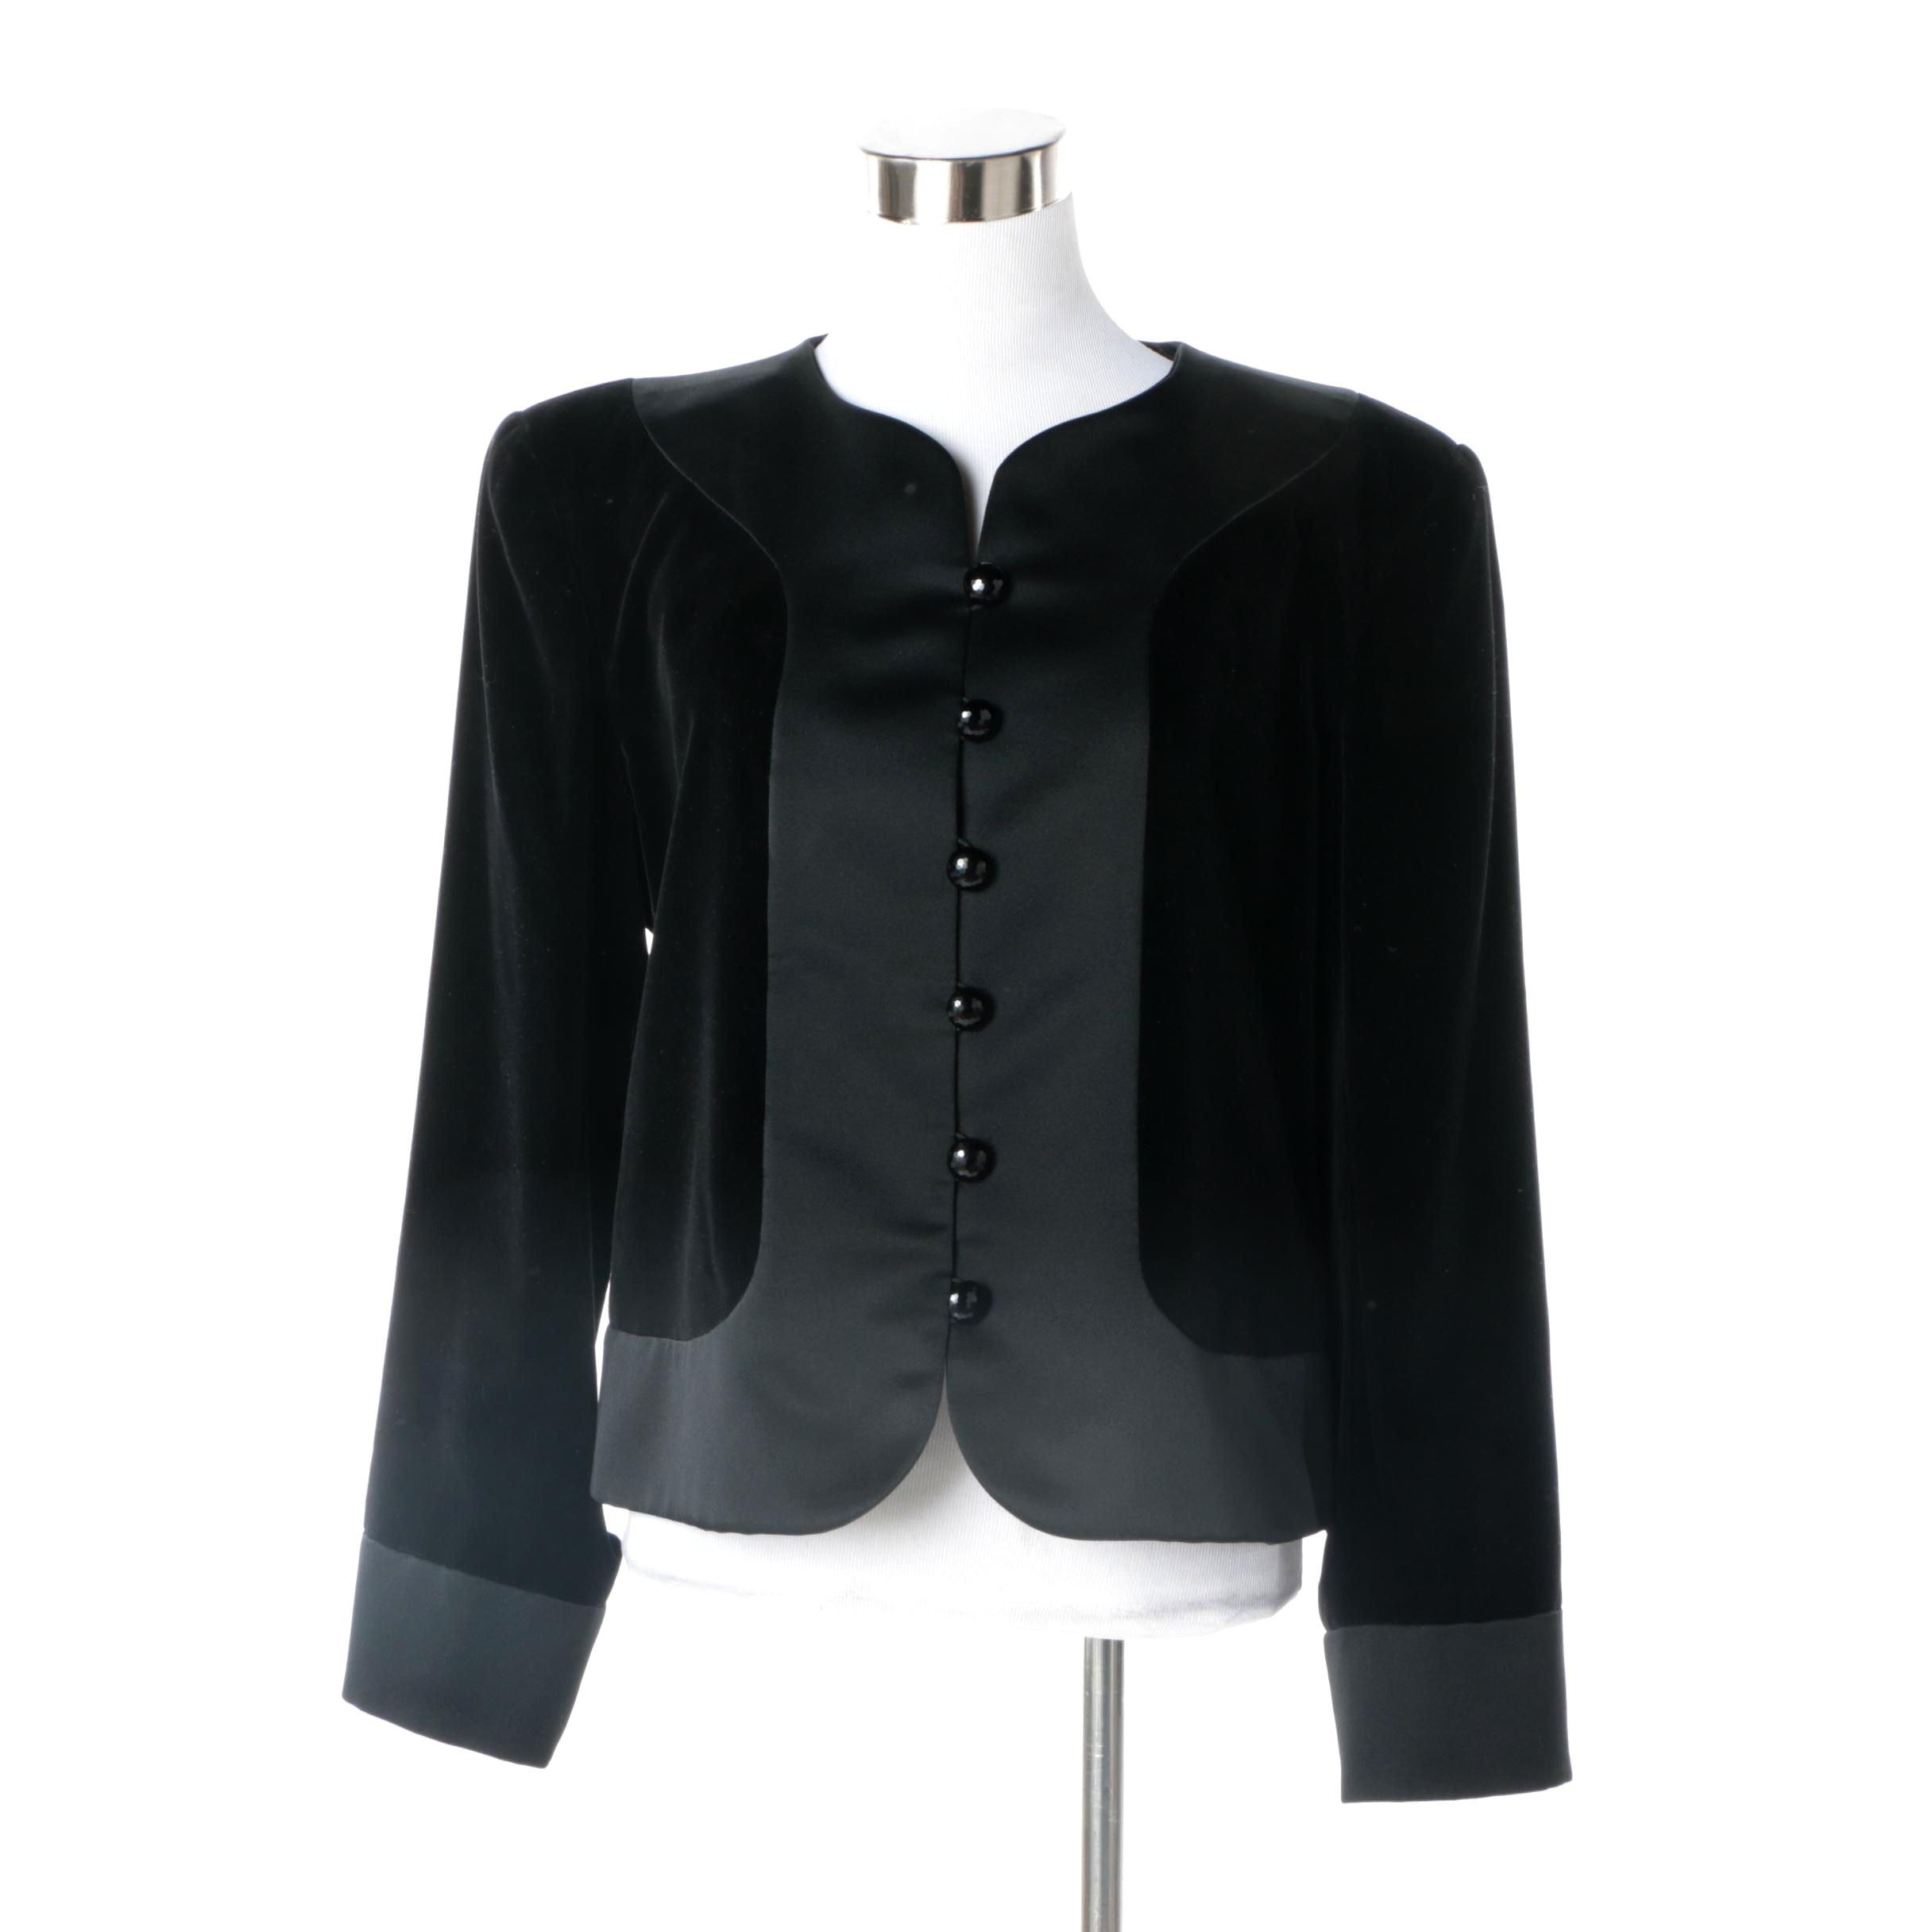 Women's Circa Early 1980s Vintage Saint Laurent Black Velveteen Jacket